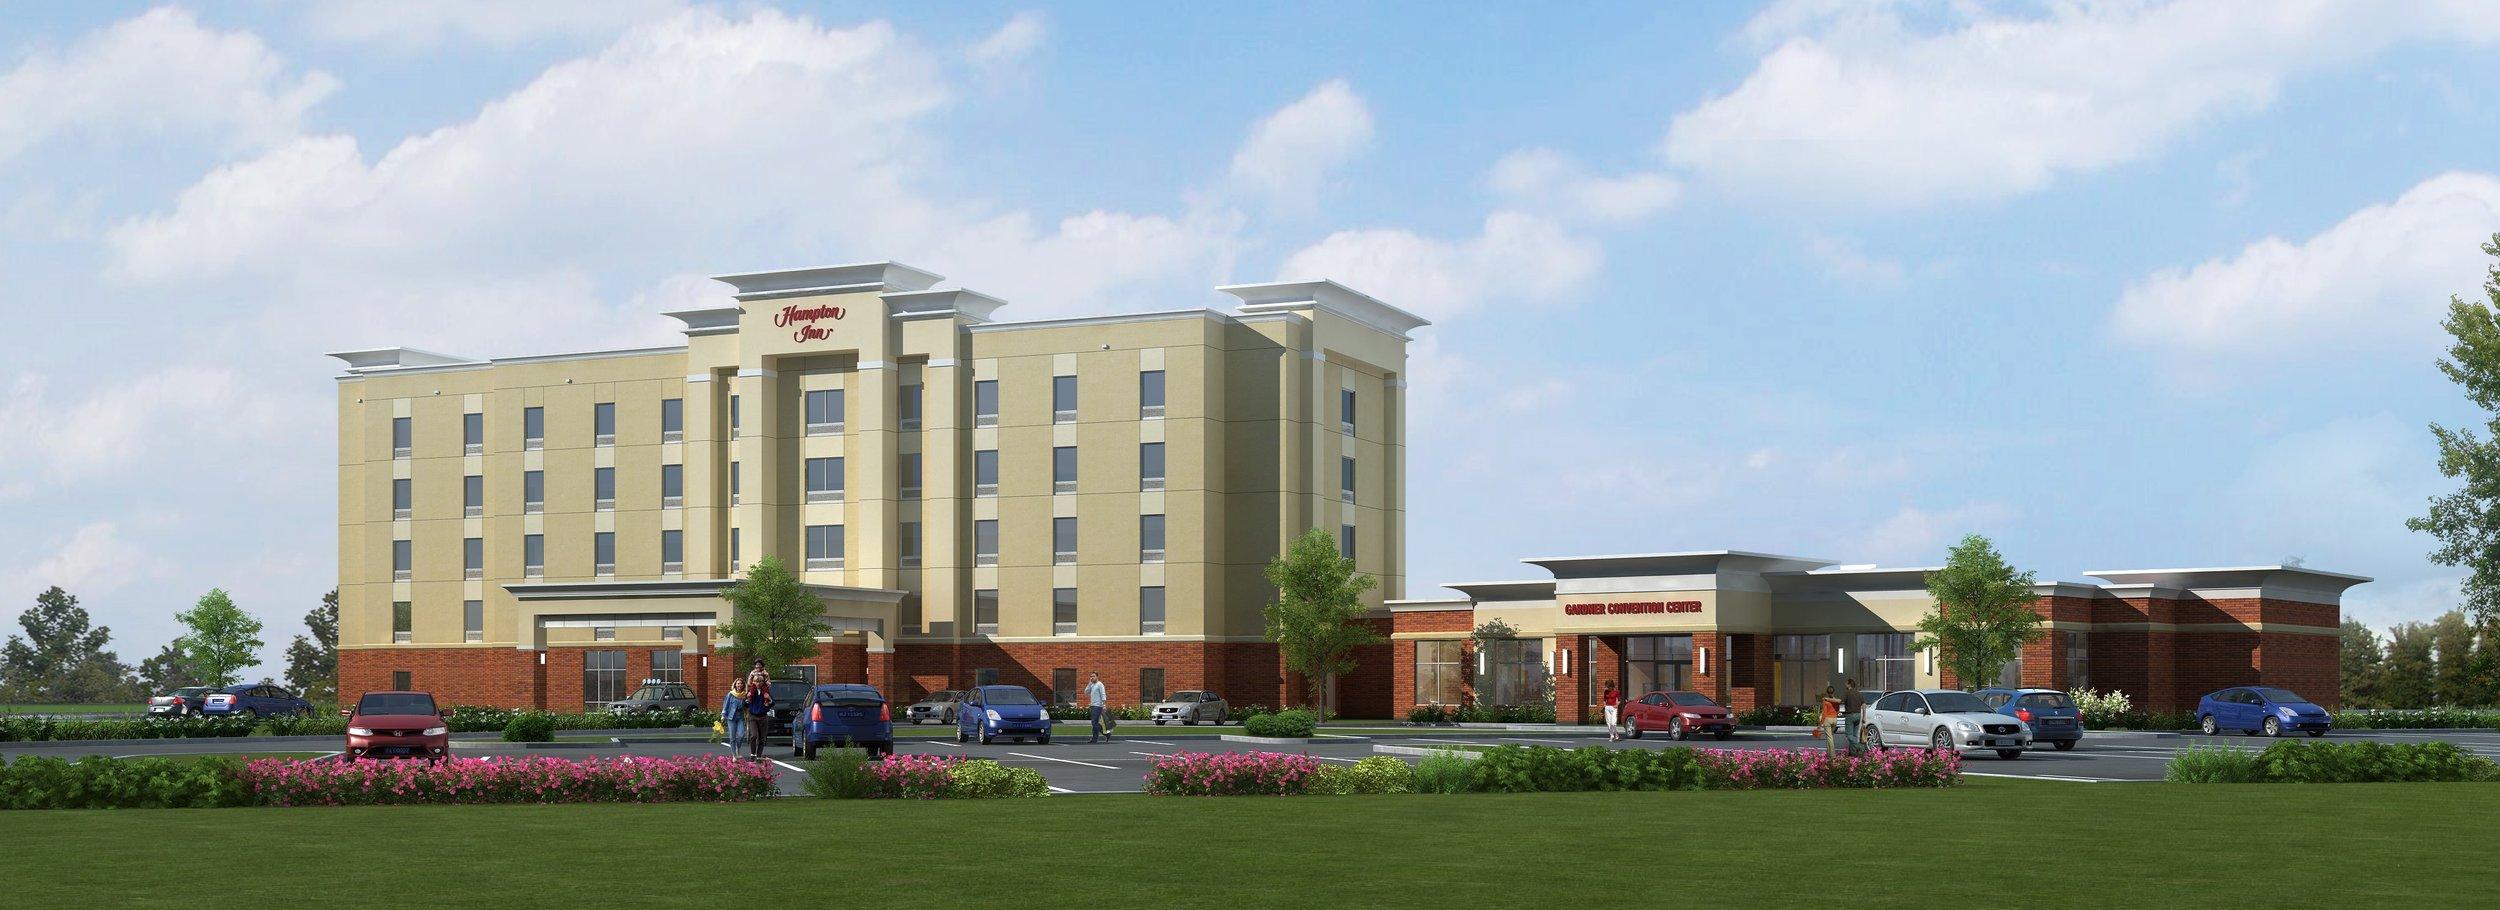 If plans are approved, developer Deepak Parmar will build an 82-room Hampton Inn Hotel in Gardner along I-35.